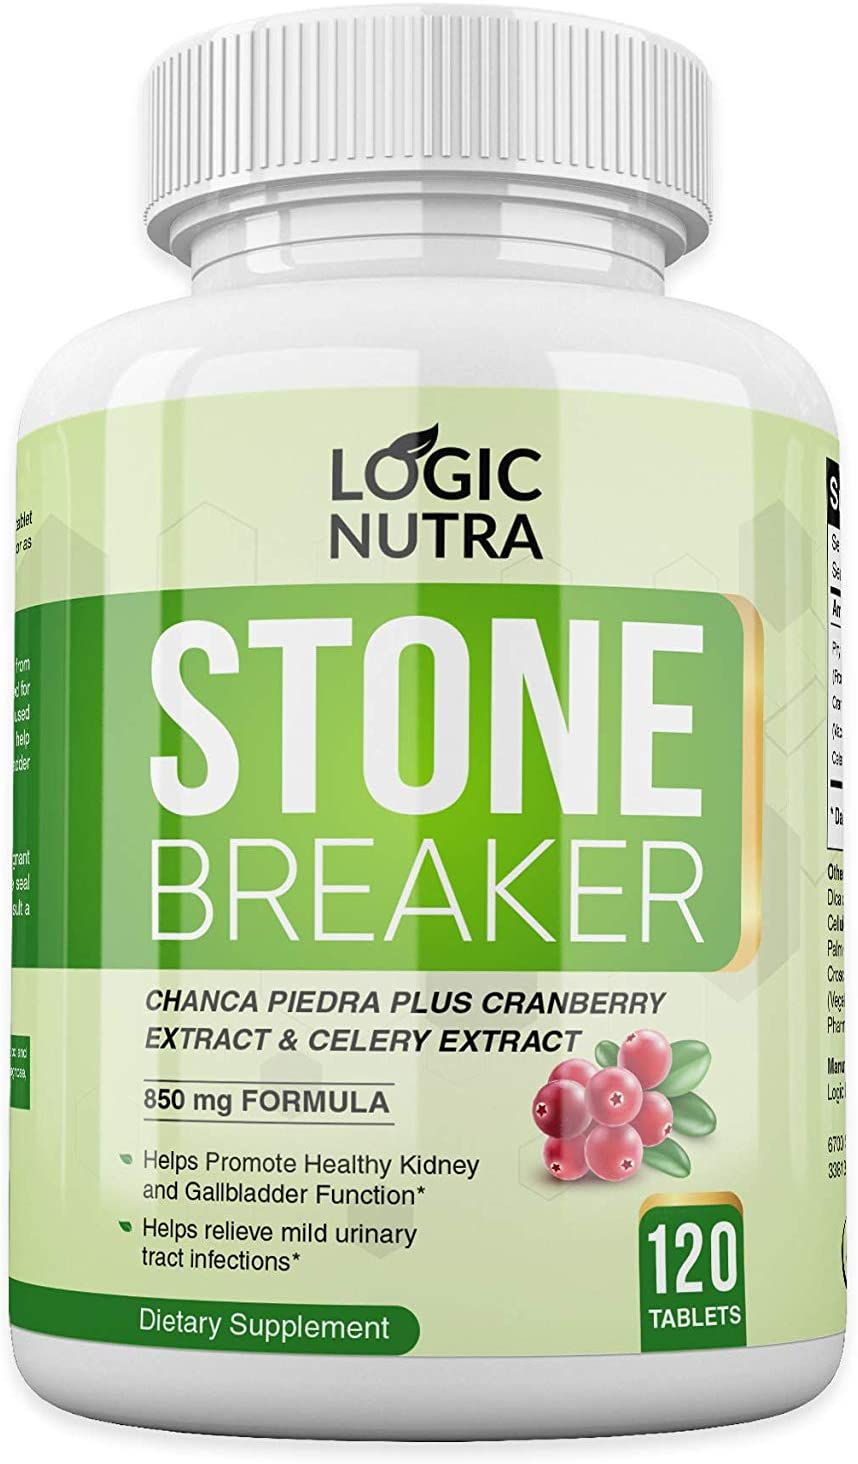 Chanca Max 53% OFF Piedra Kidney Stone Breaker by 80 Nutra Portland Mall Tablets 120 Logic